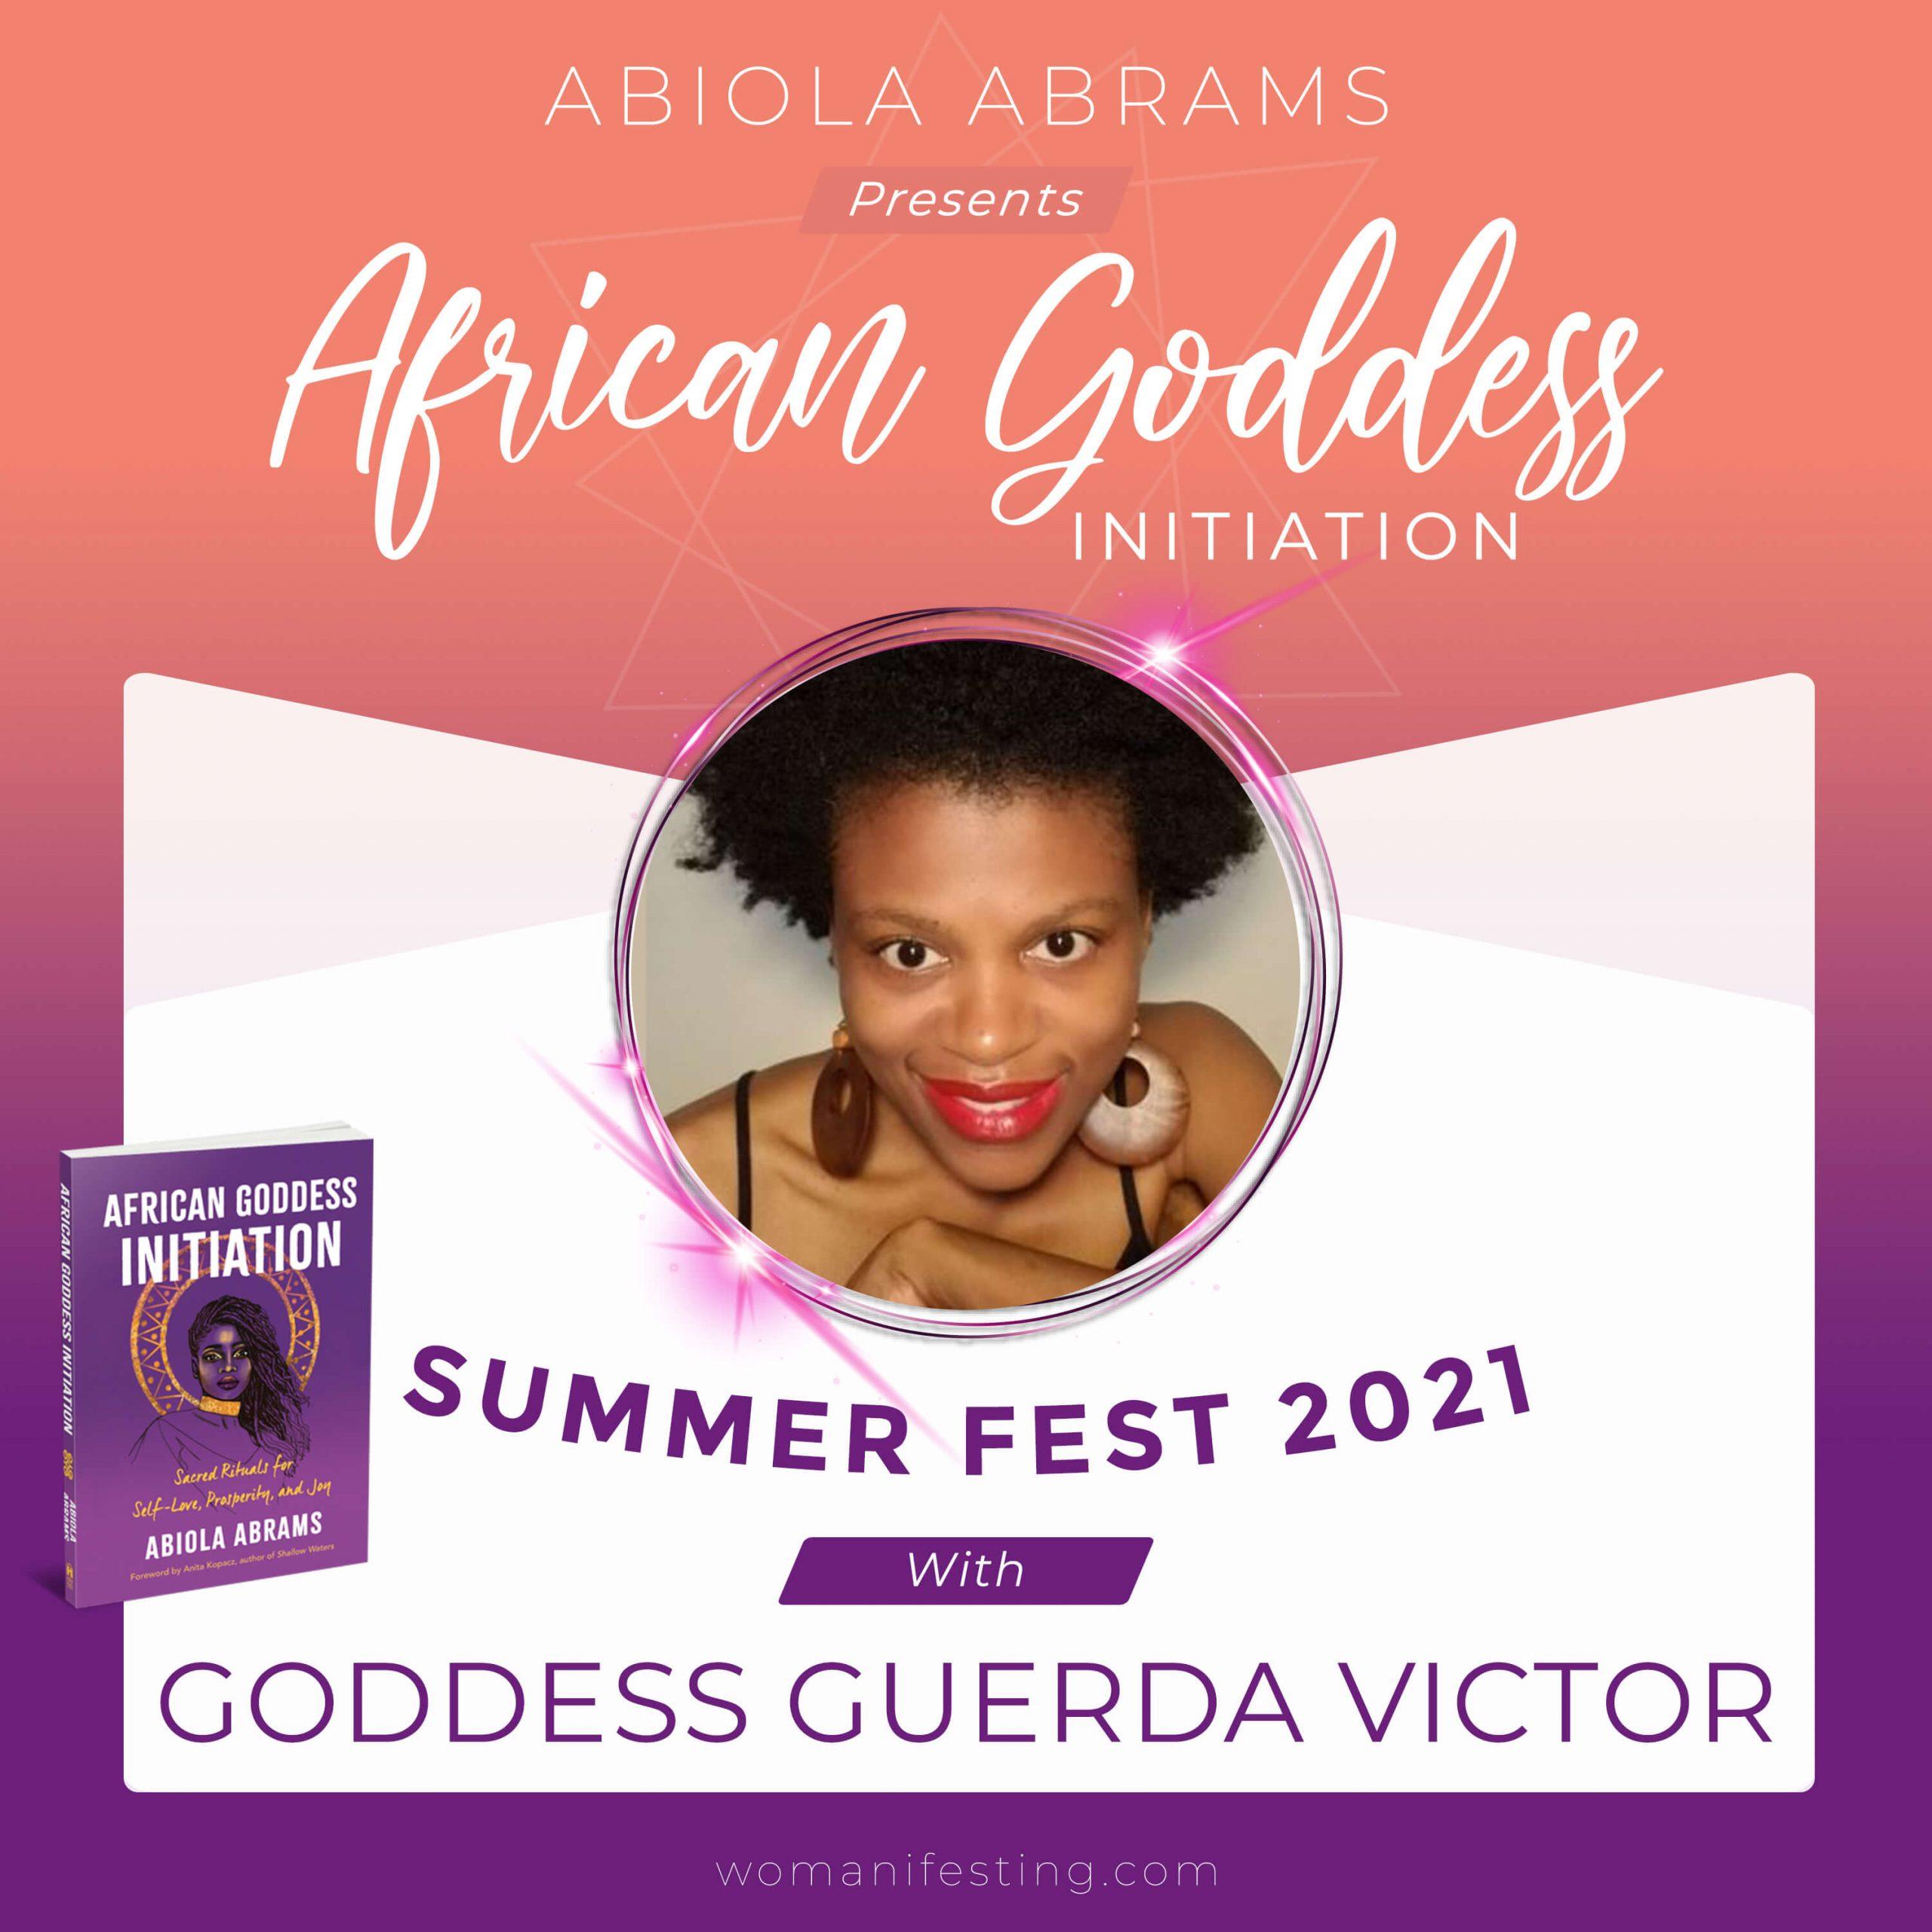 Goddess Guerda Victor: African Goddess Initiation Fest Guru